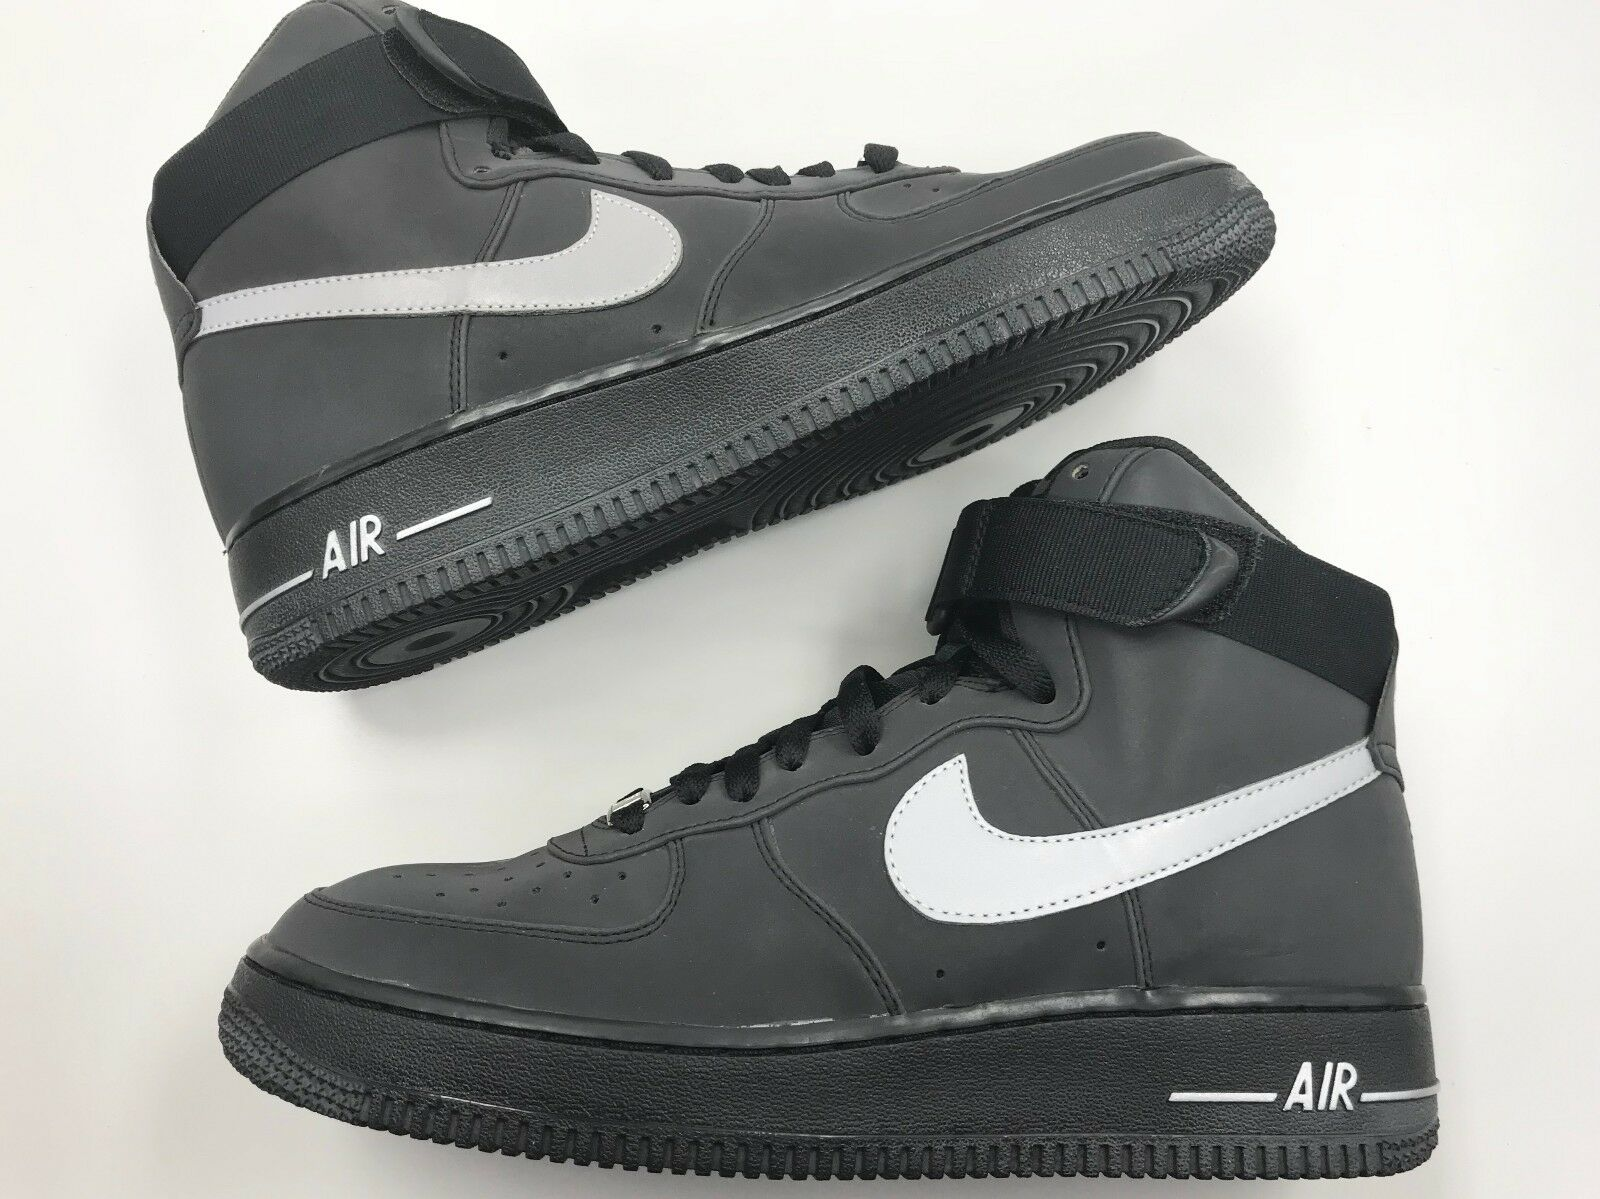 DS Nike Air Force 1 High Premium LE reflective black metallic silver men shoes